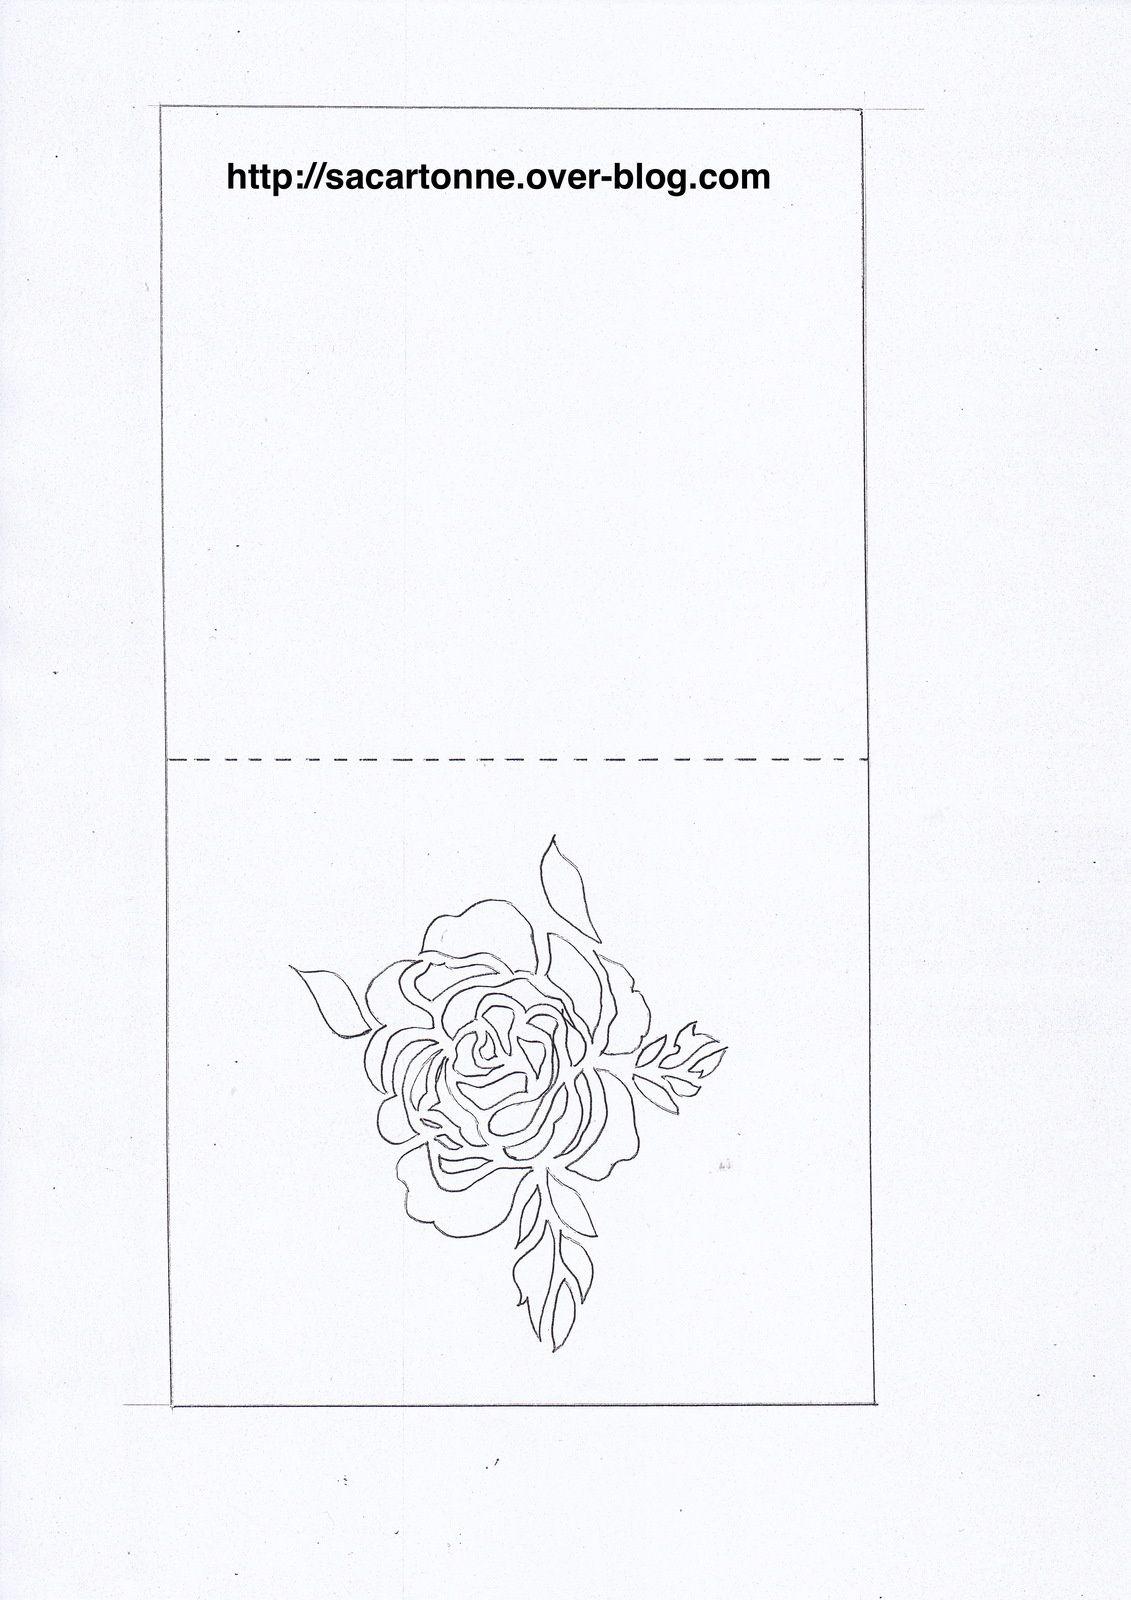 Gabarit gratuit Kirigami fleur | printables - template | Pinterest ...